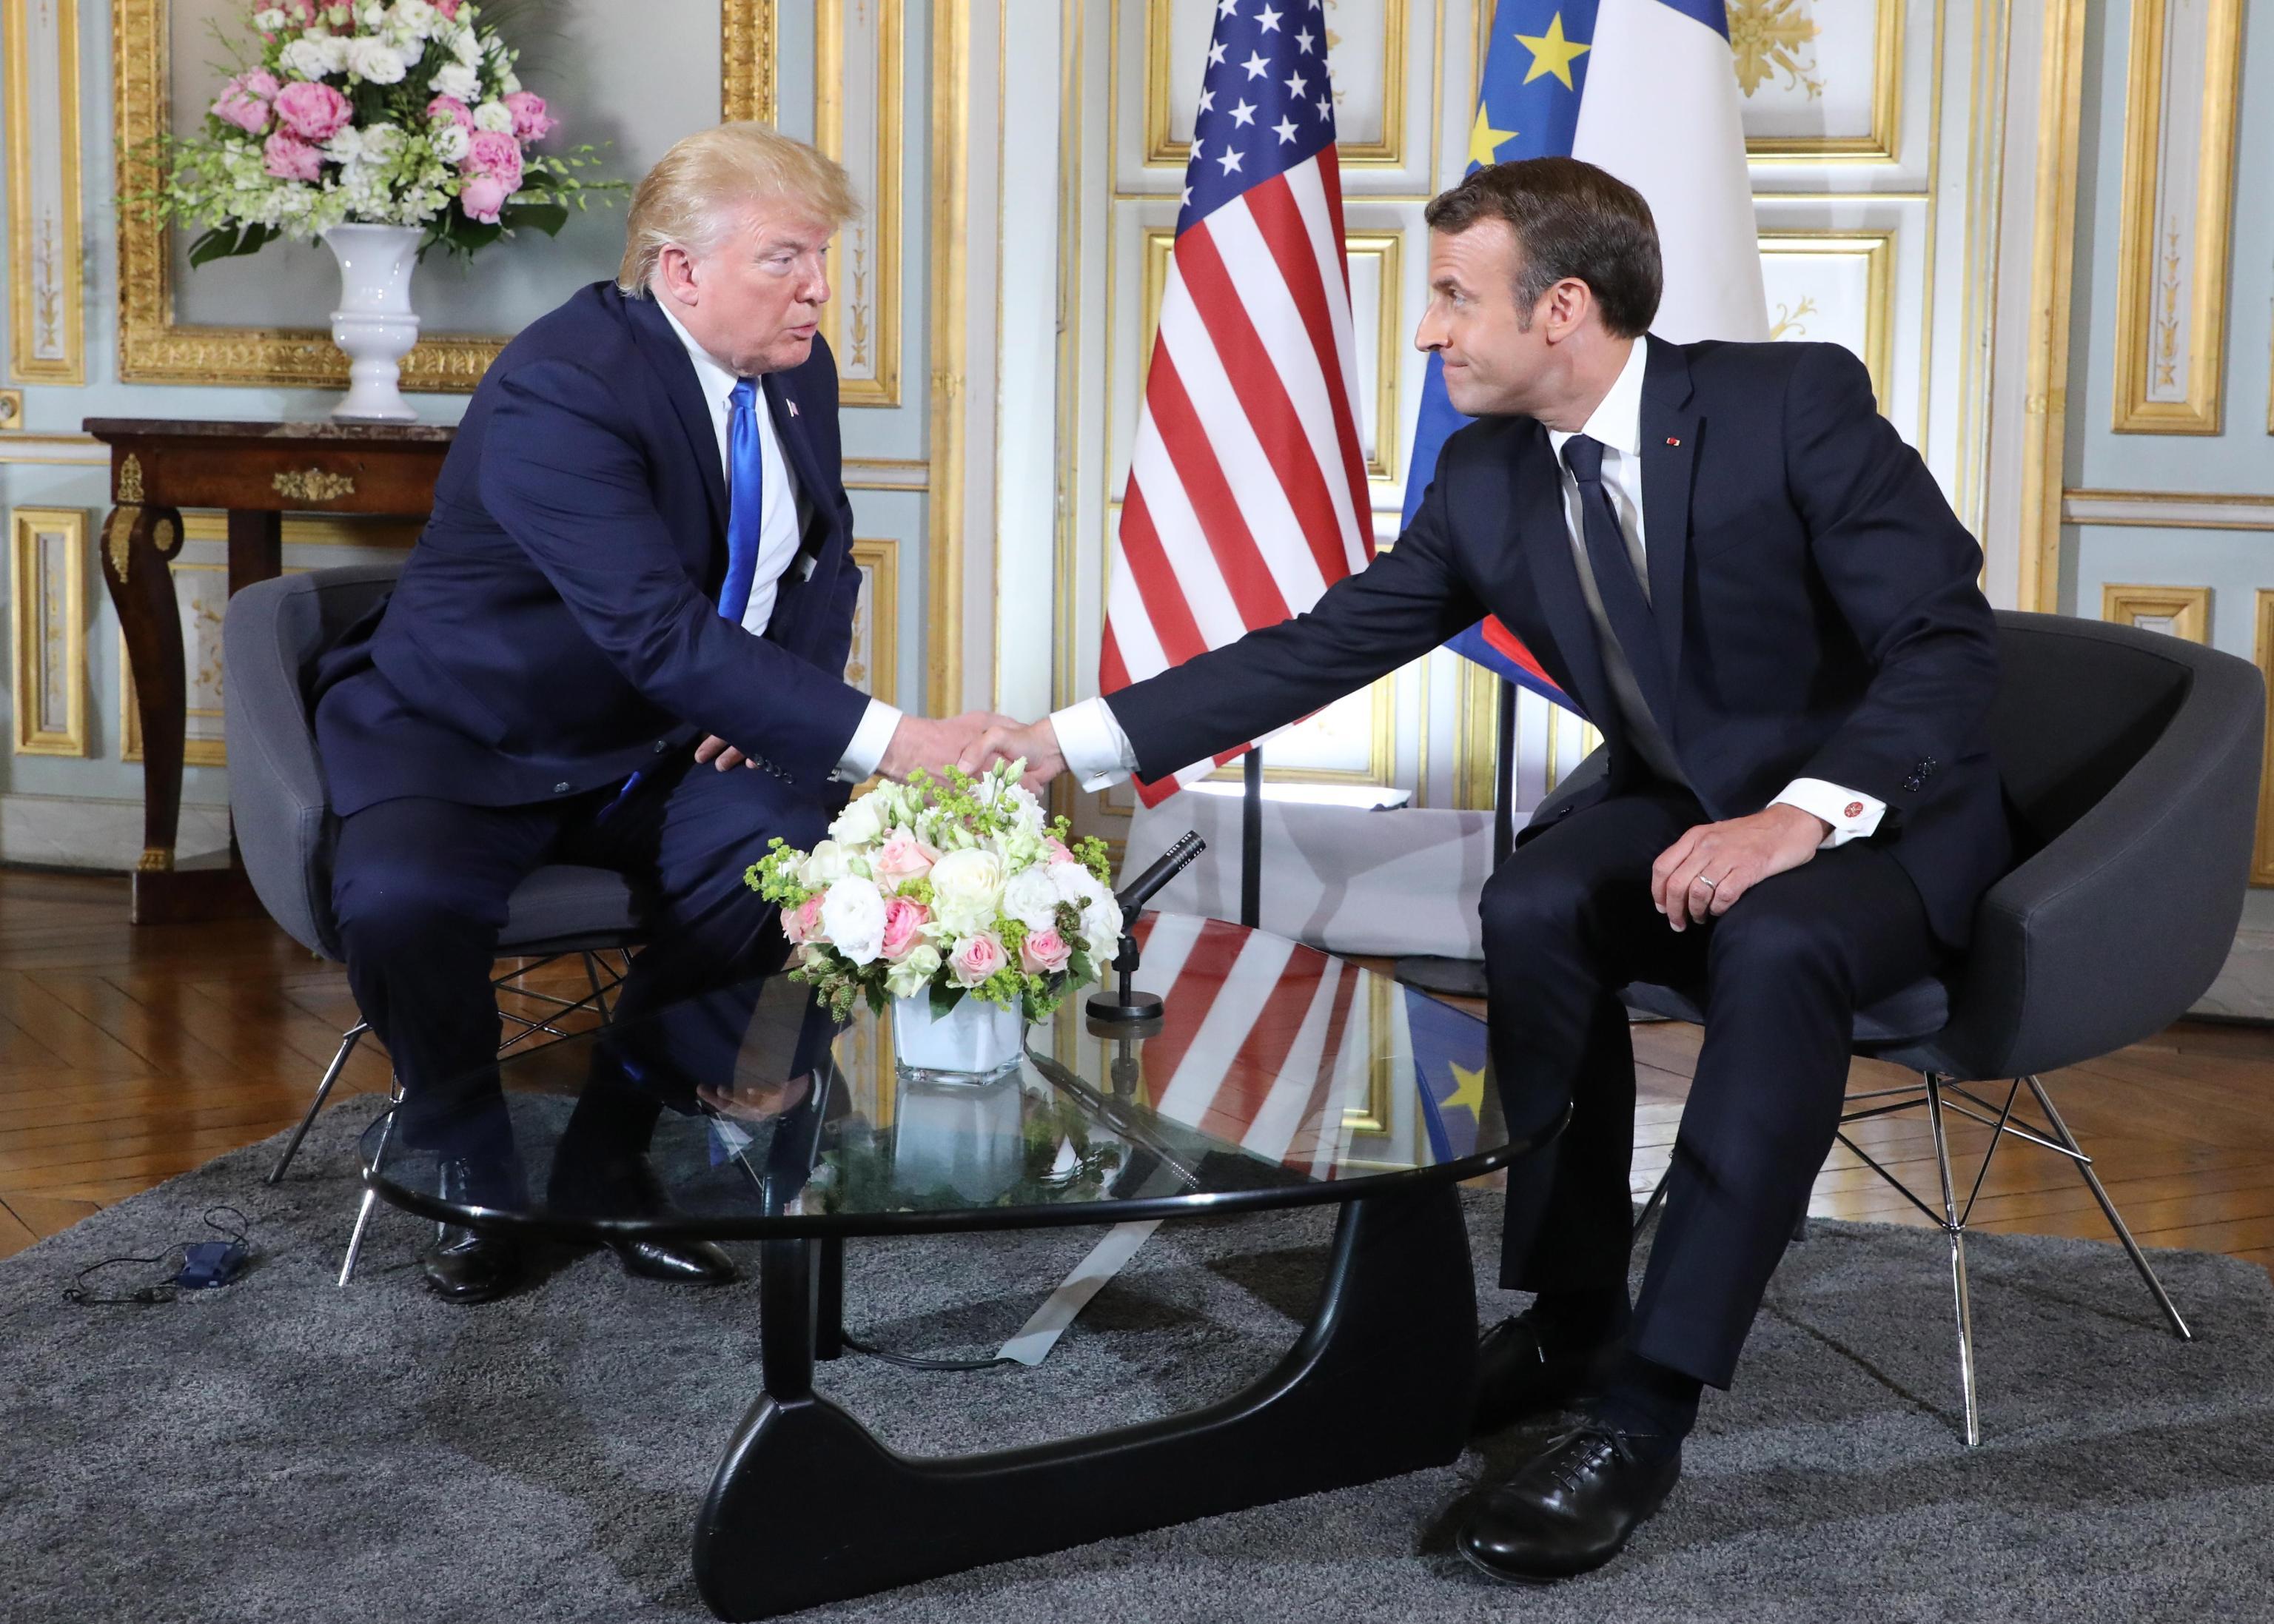 Nucleare iraniano, Trump e Macron: aprire